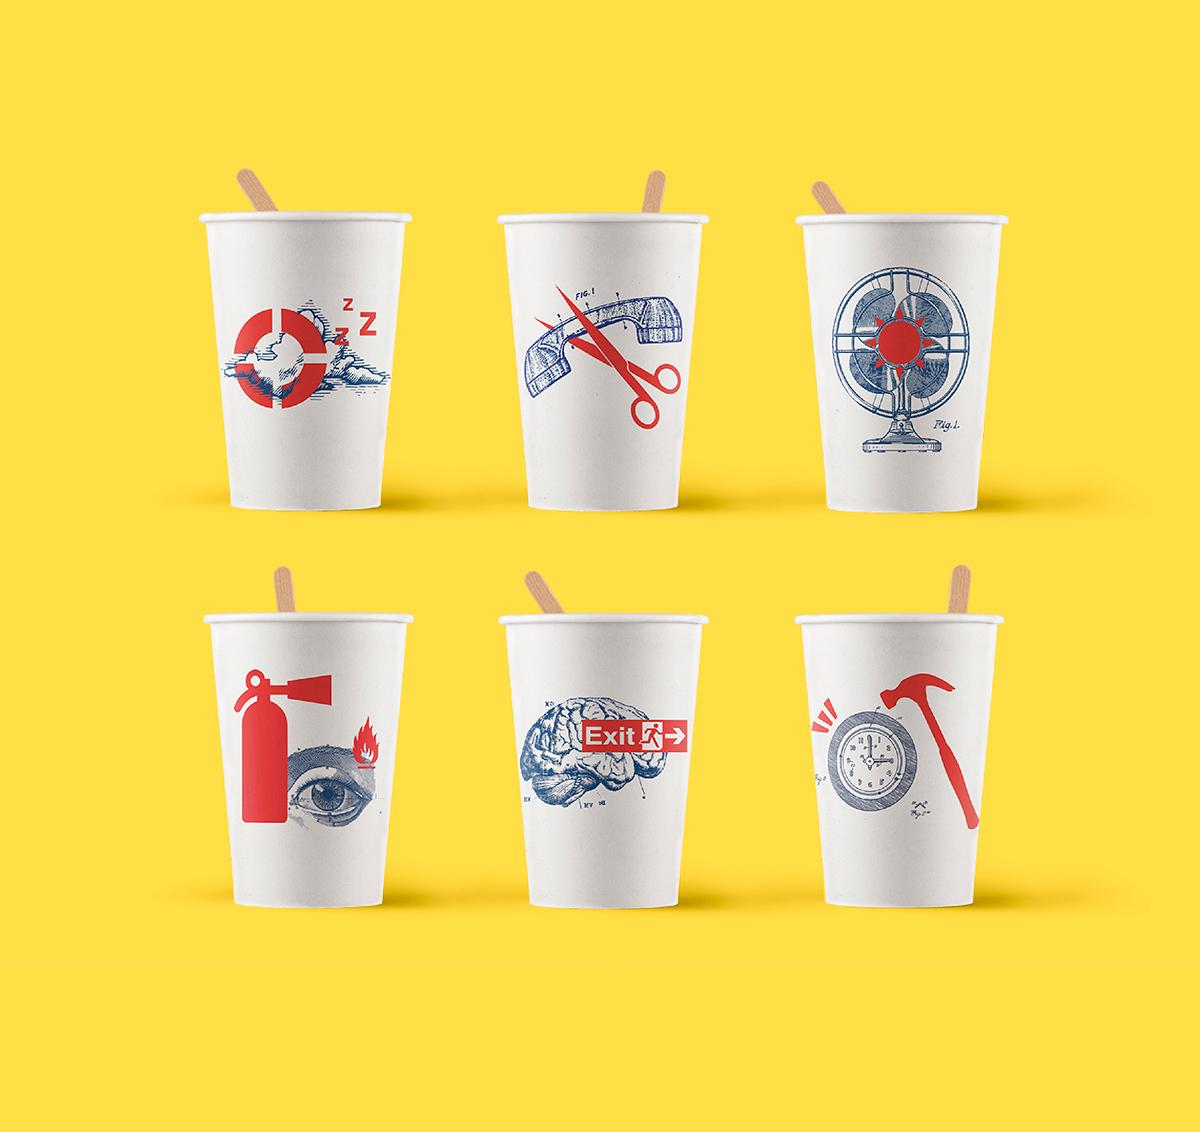 vending,vaso,plastic glass,Illustation,Illustrator,adobe,red,blue,cup